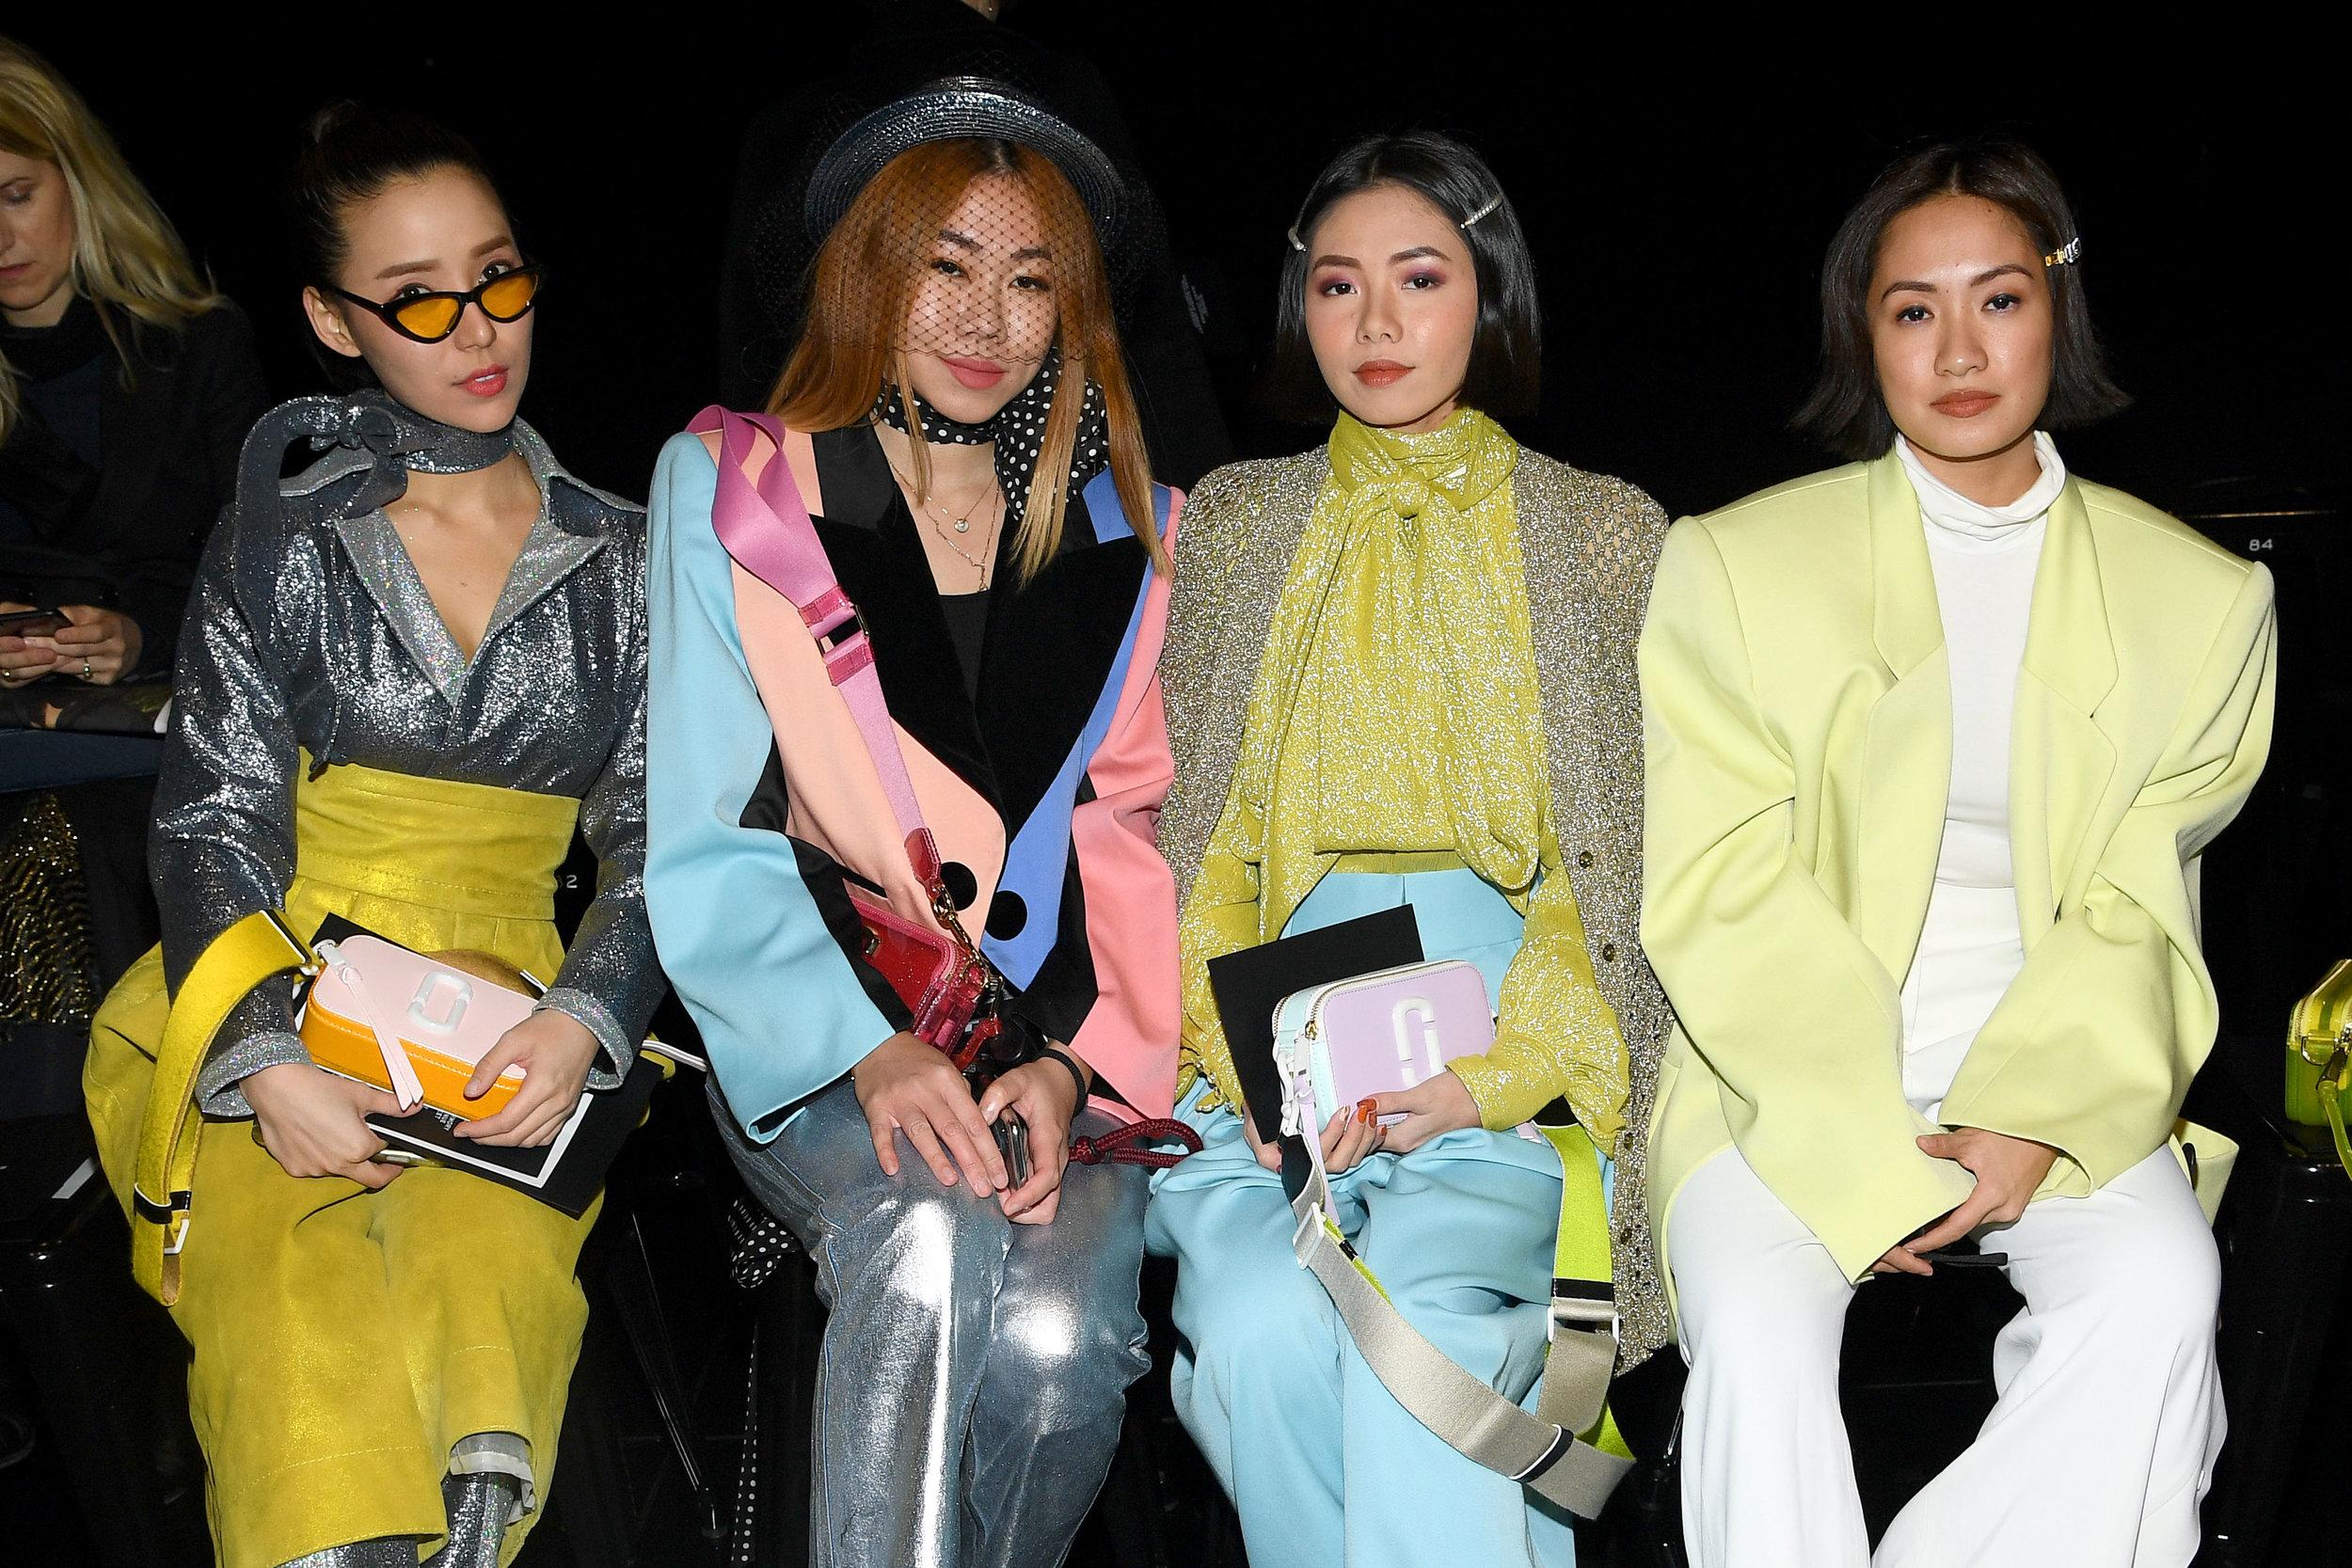 Venice Min, Nellie Lim, Olivia Lazuardy and Laureen Uy.JPG